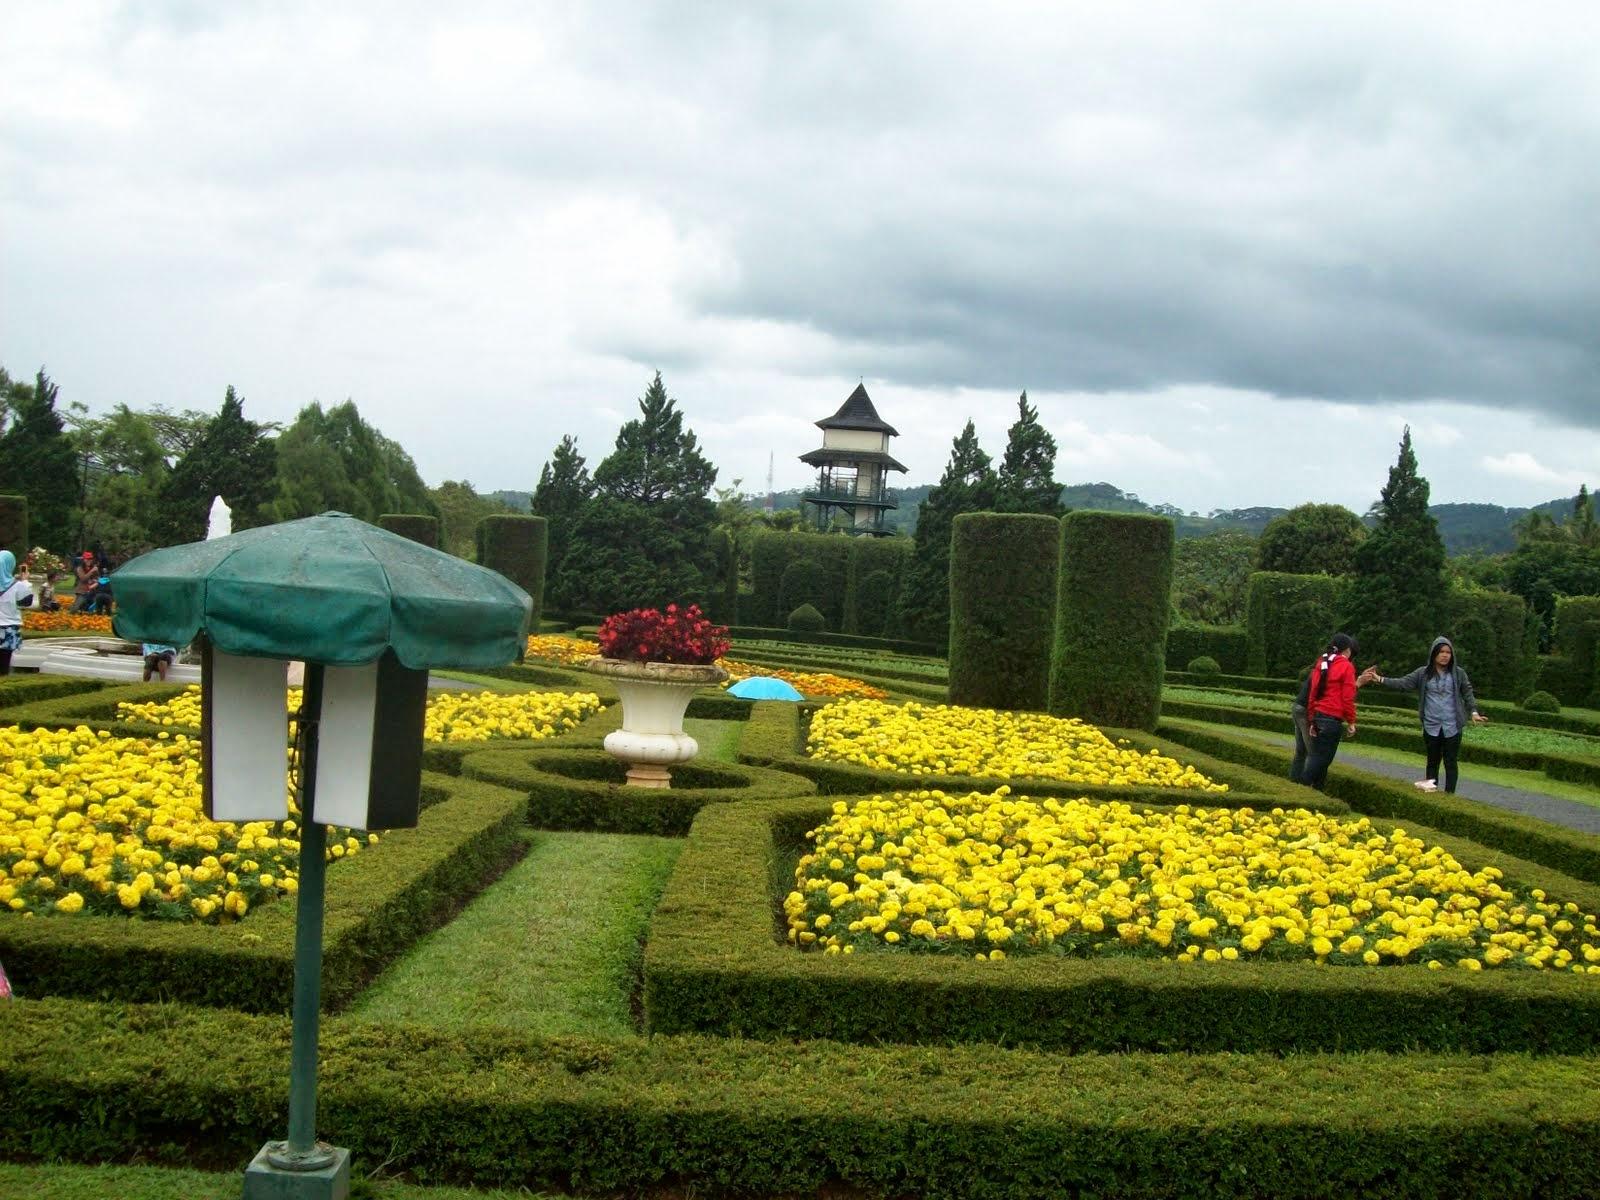 Taman Berlibur Taman Bunga Pilihan Wisata Kota Cibubur